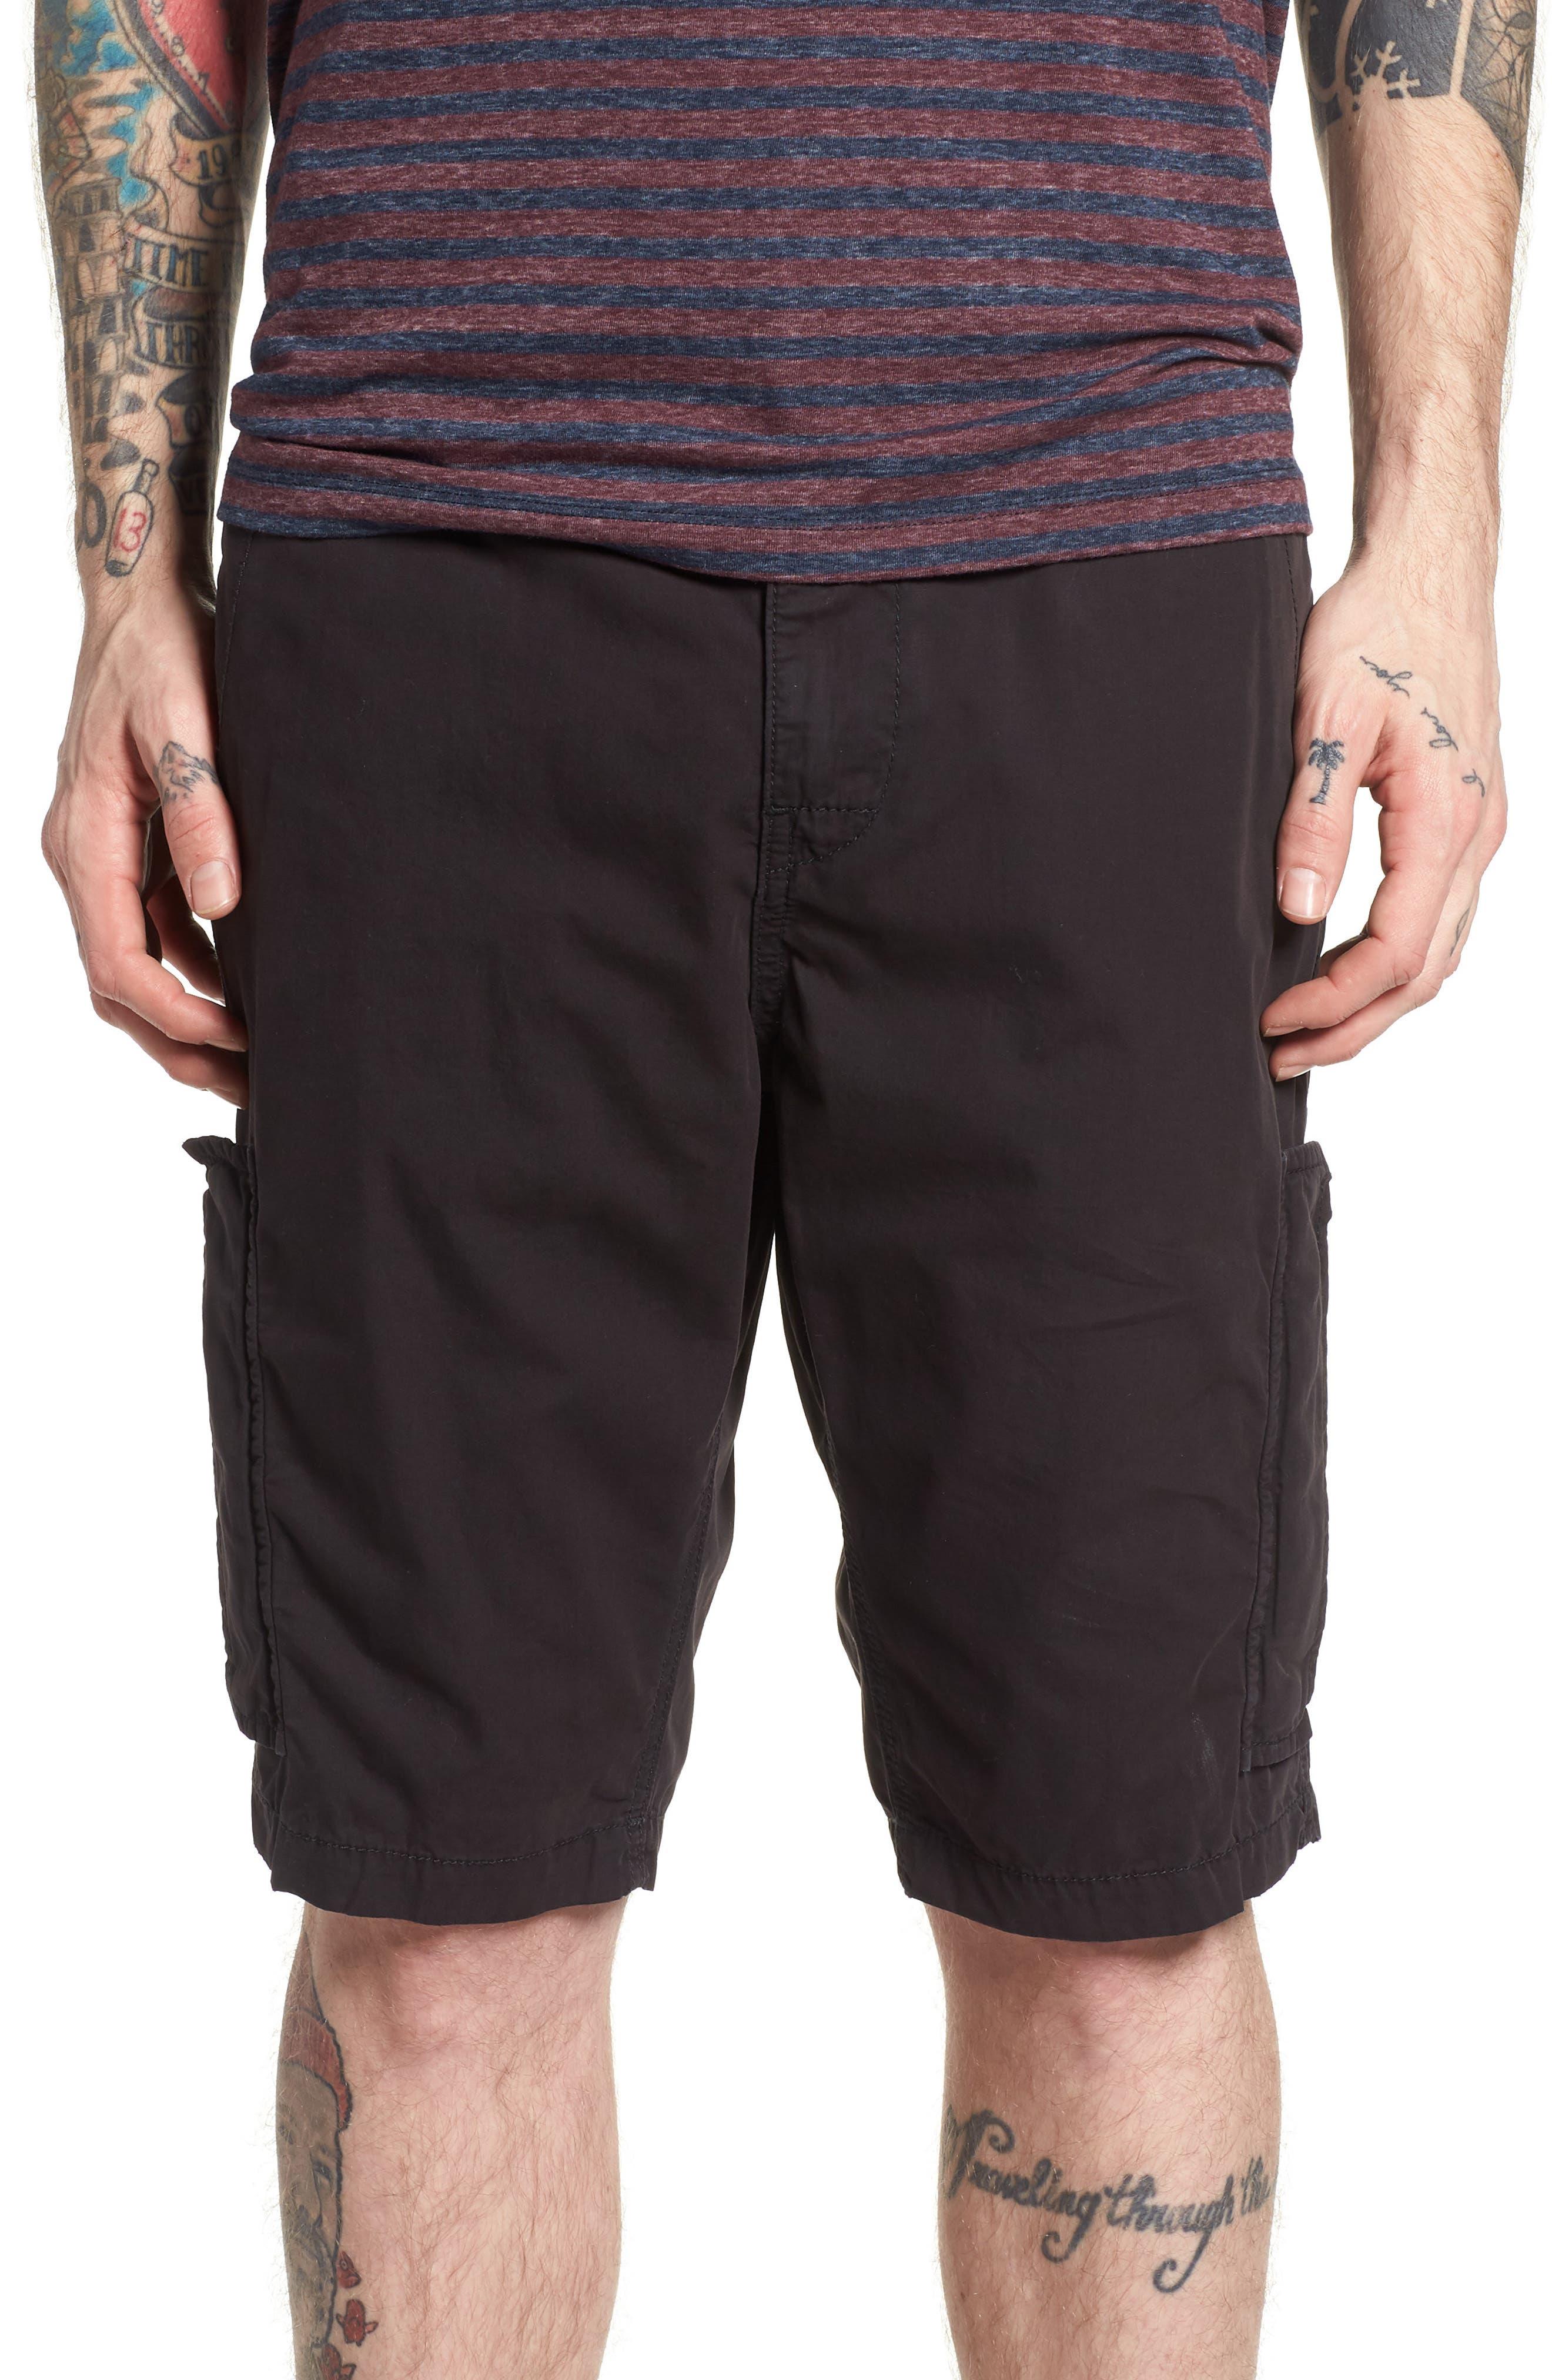 True Religion Brand Jeans Officer Field Shorts